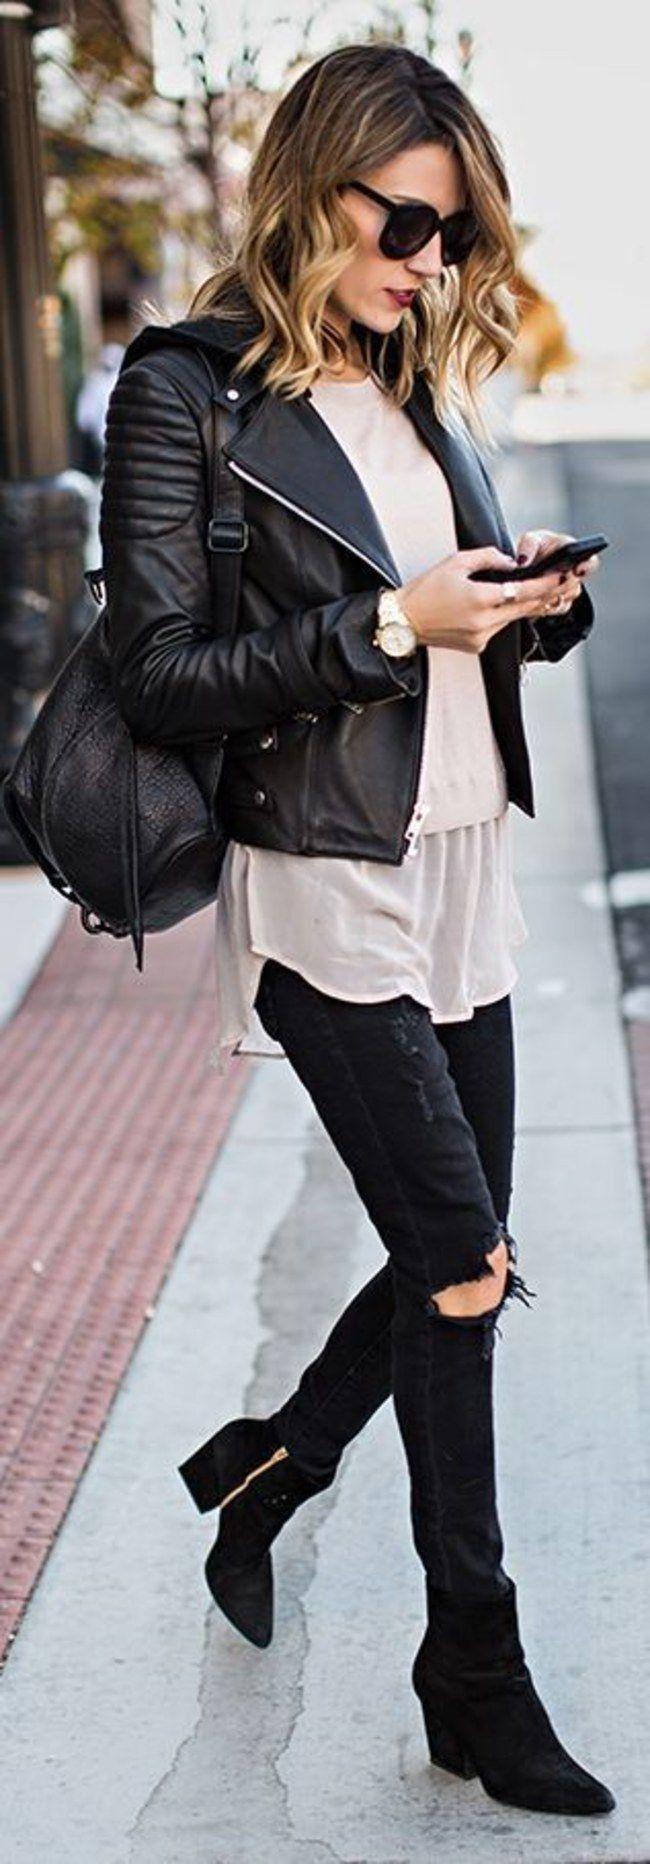 Skinny Jeans kombinieren: Das sind die Trend-Looks im Herbst 2015!